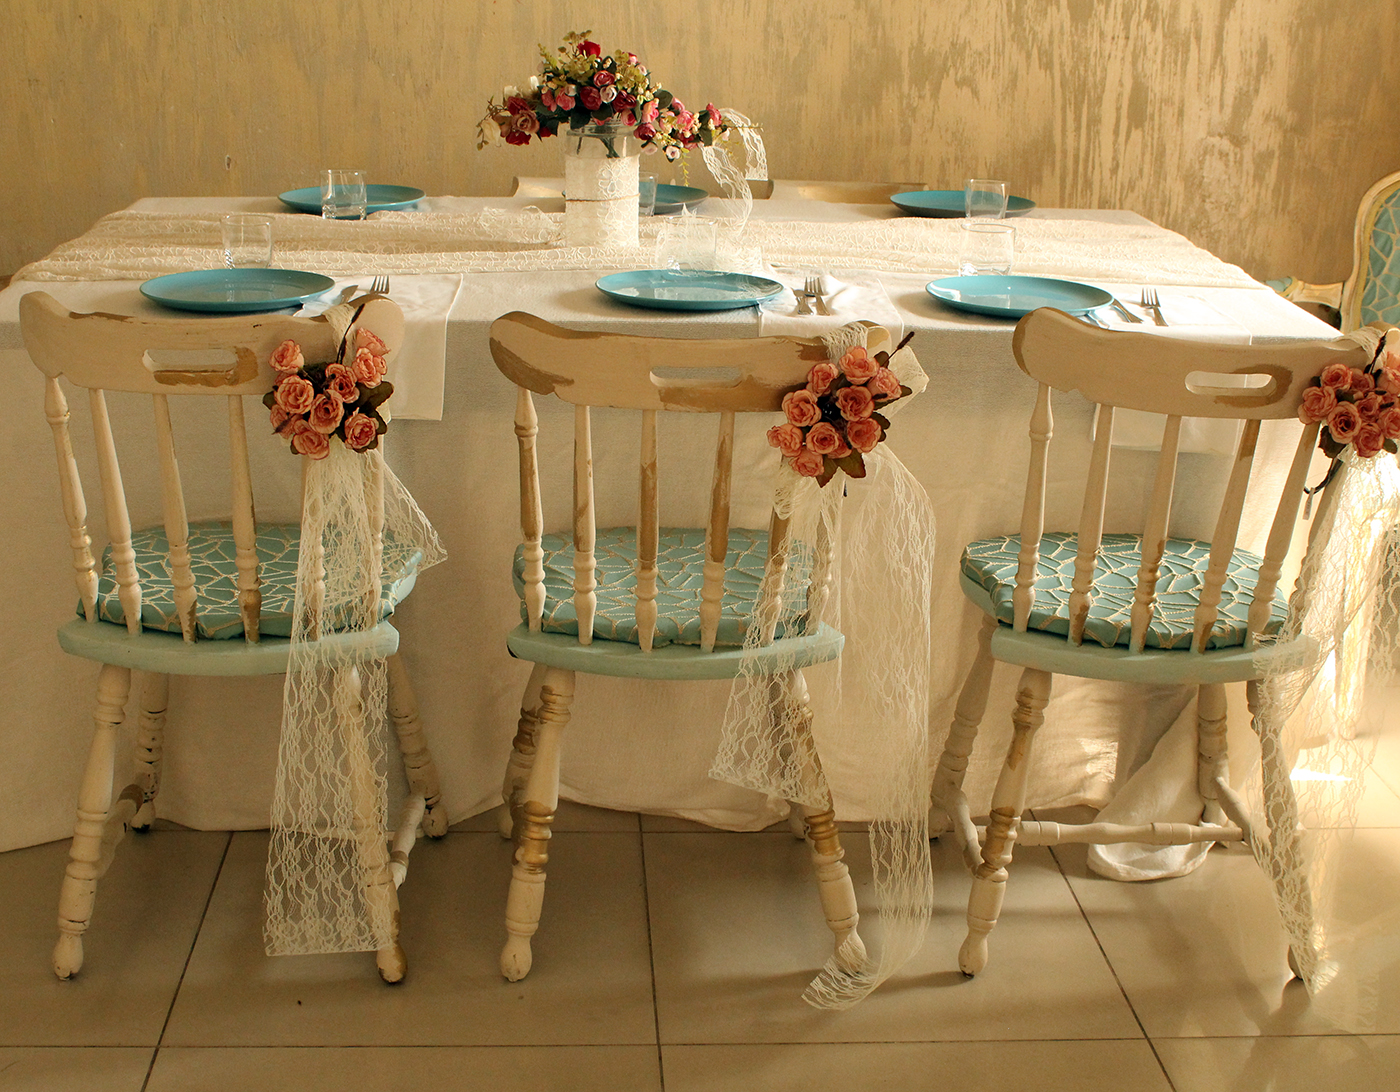 IMG 8141 - חידוש כסאות לפינת אוכל בסלון